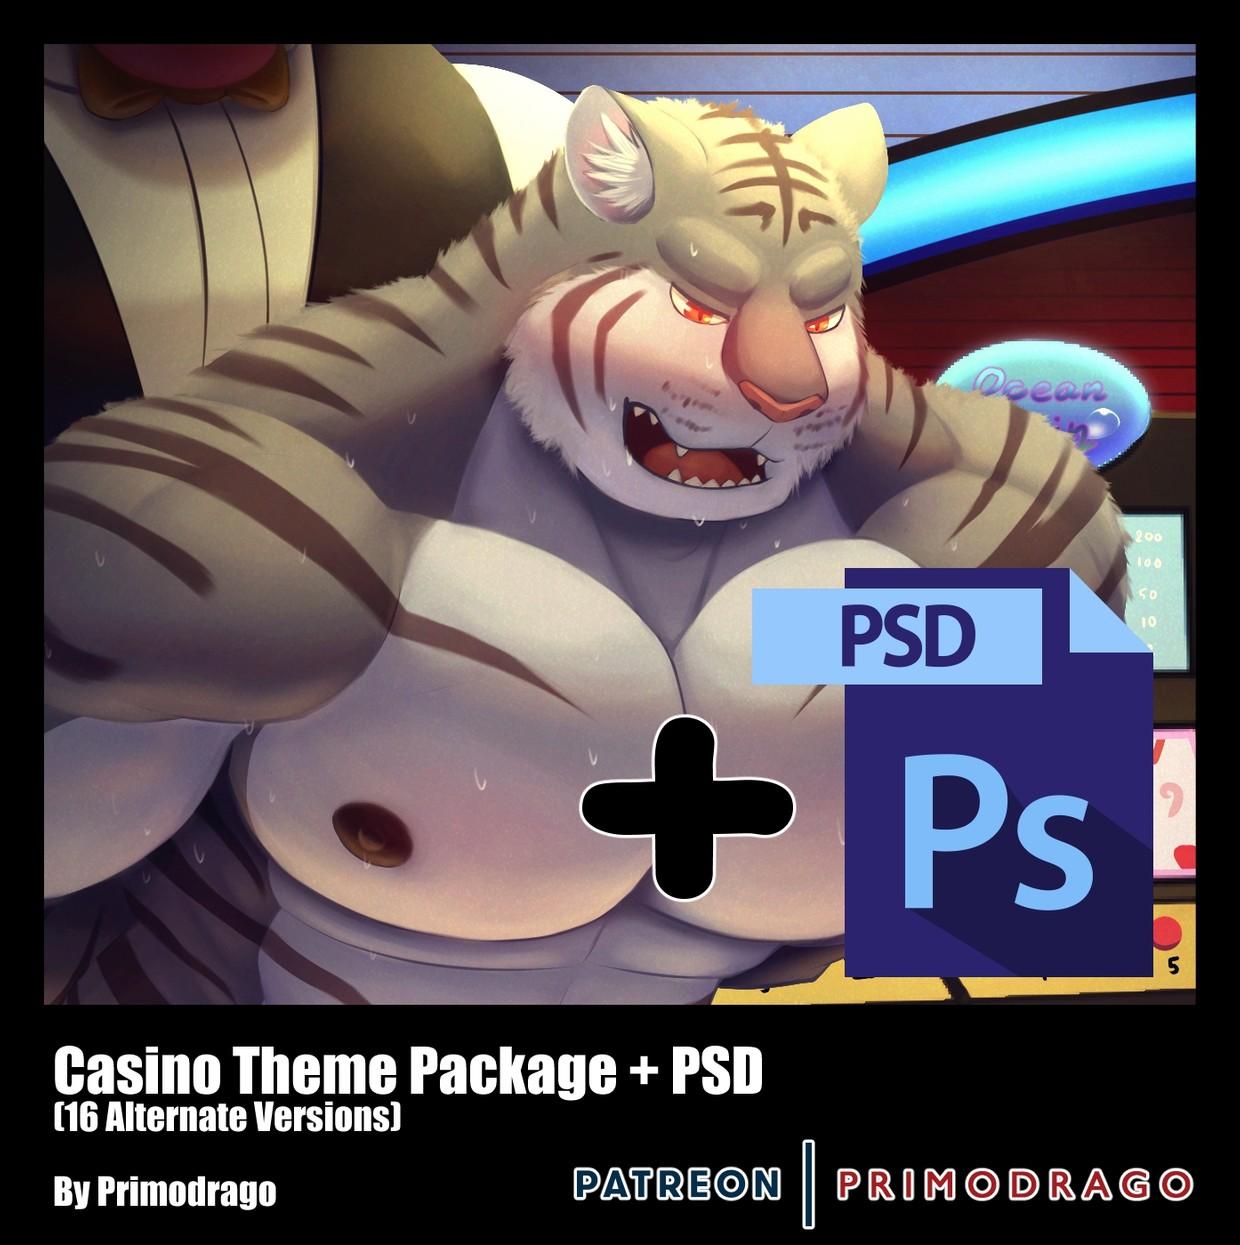 Casino Theme + PSD File